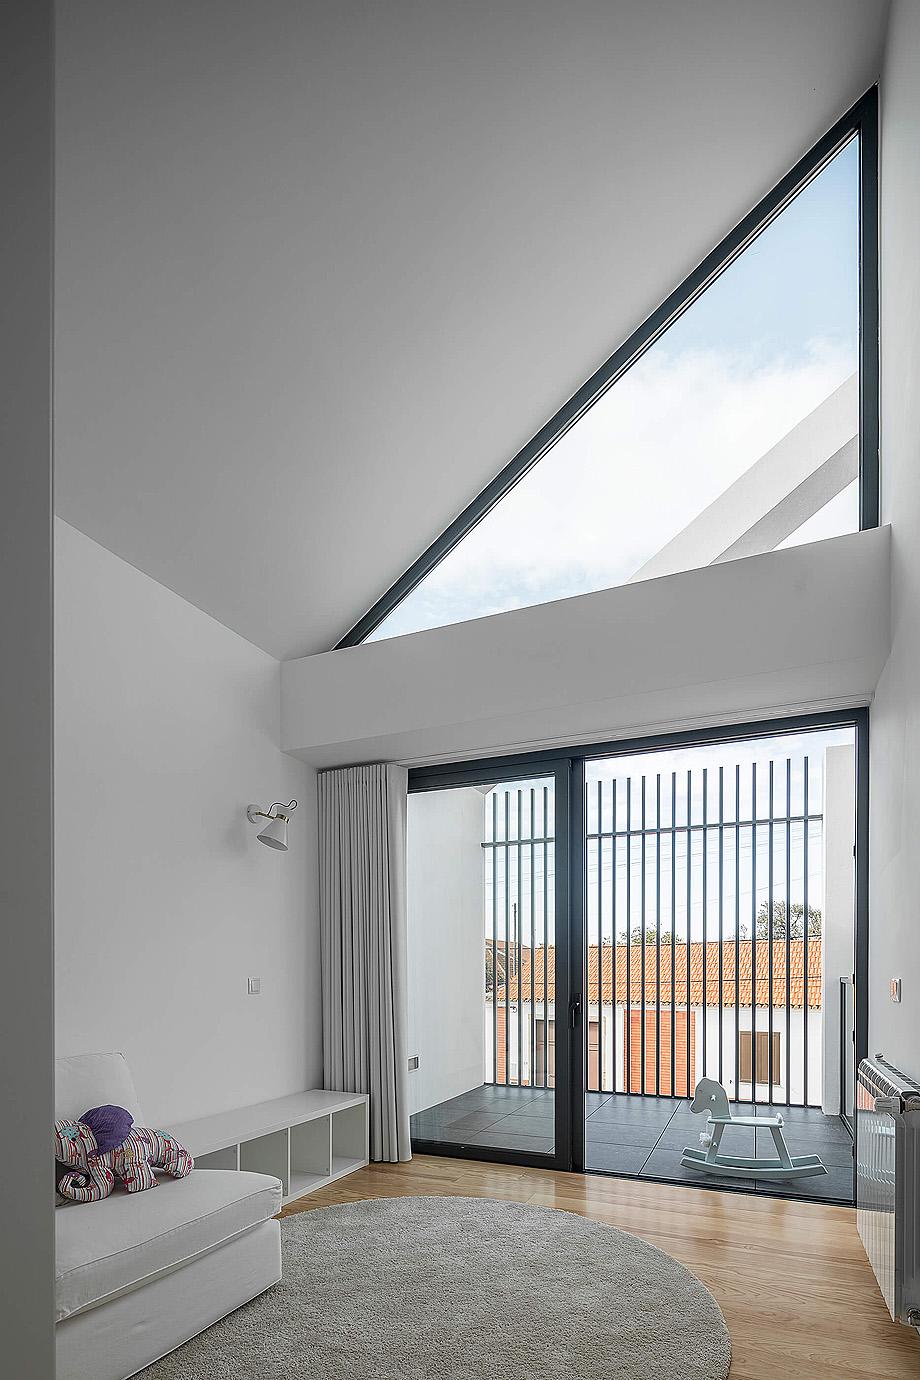 casa do arco de frari architecture network - foto ivo tavares (24)